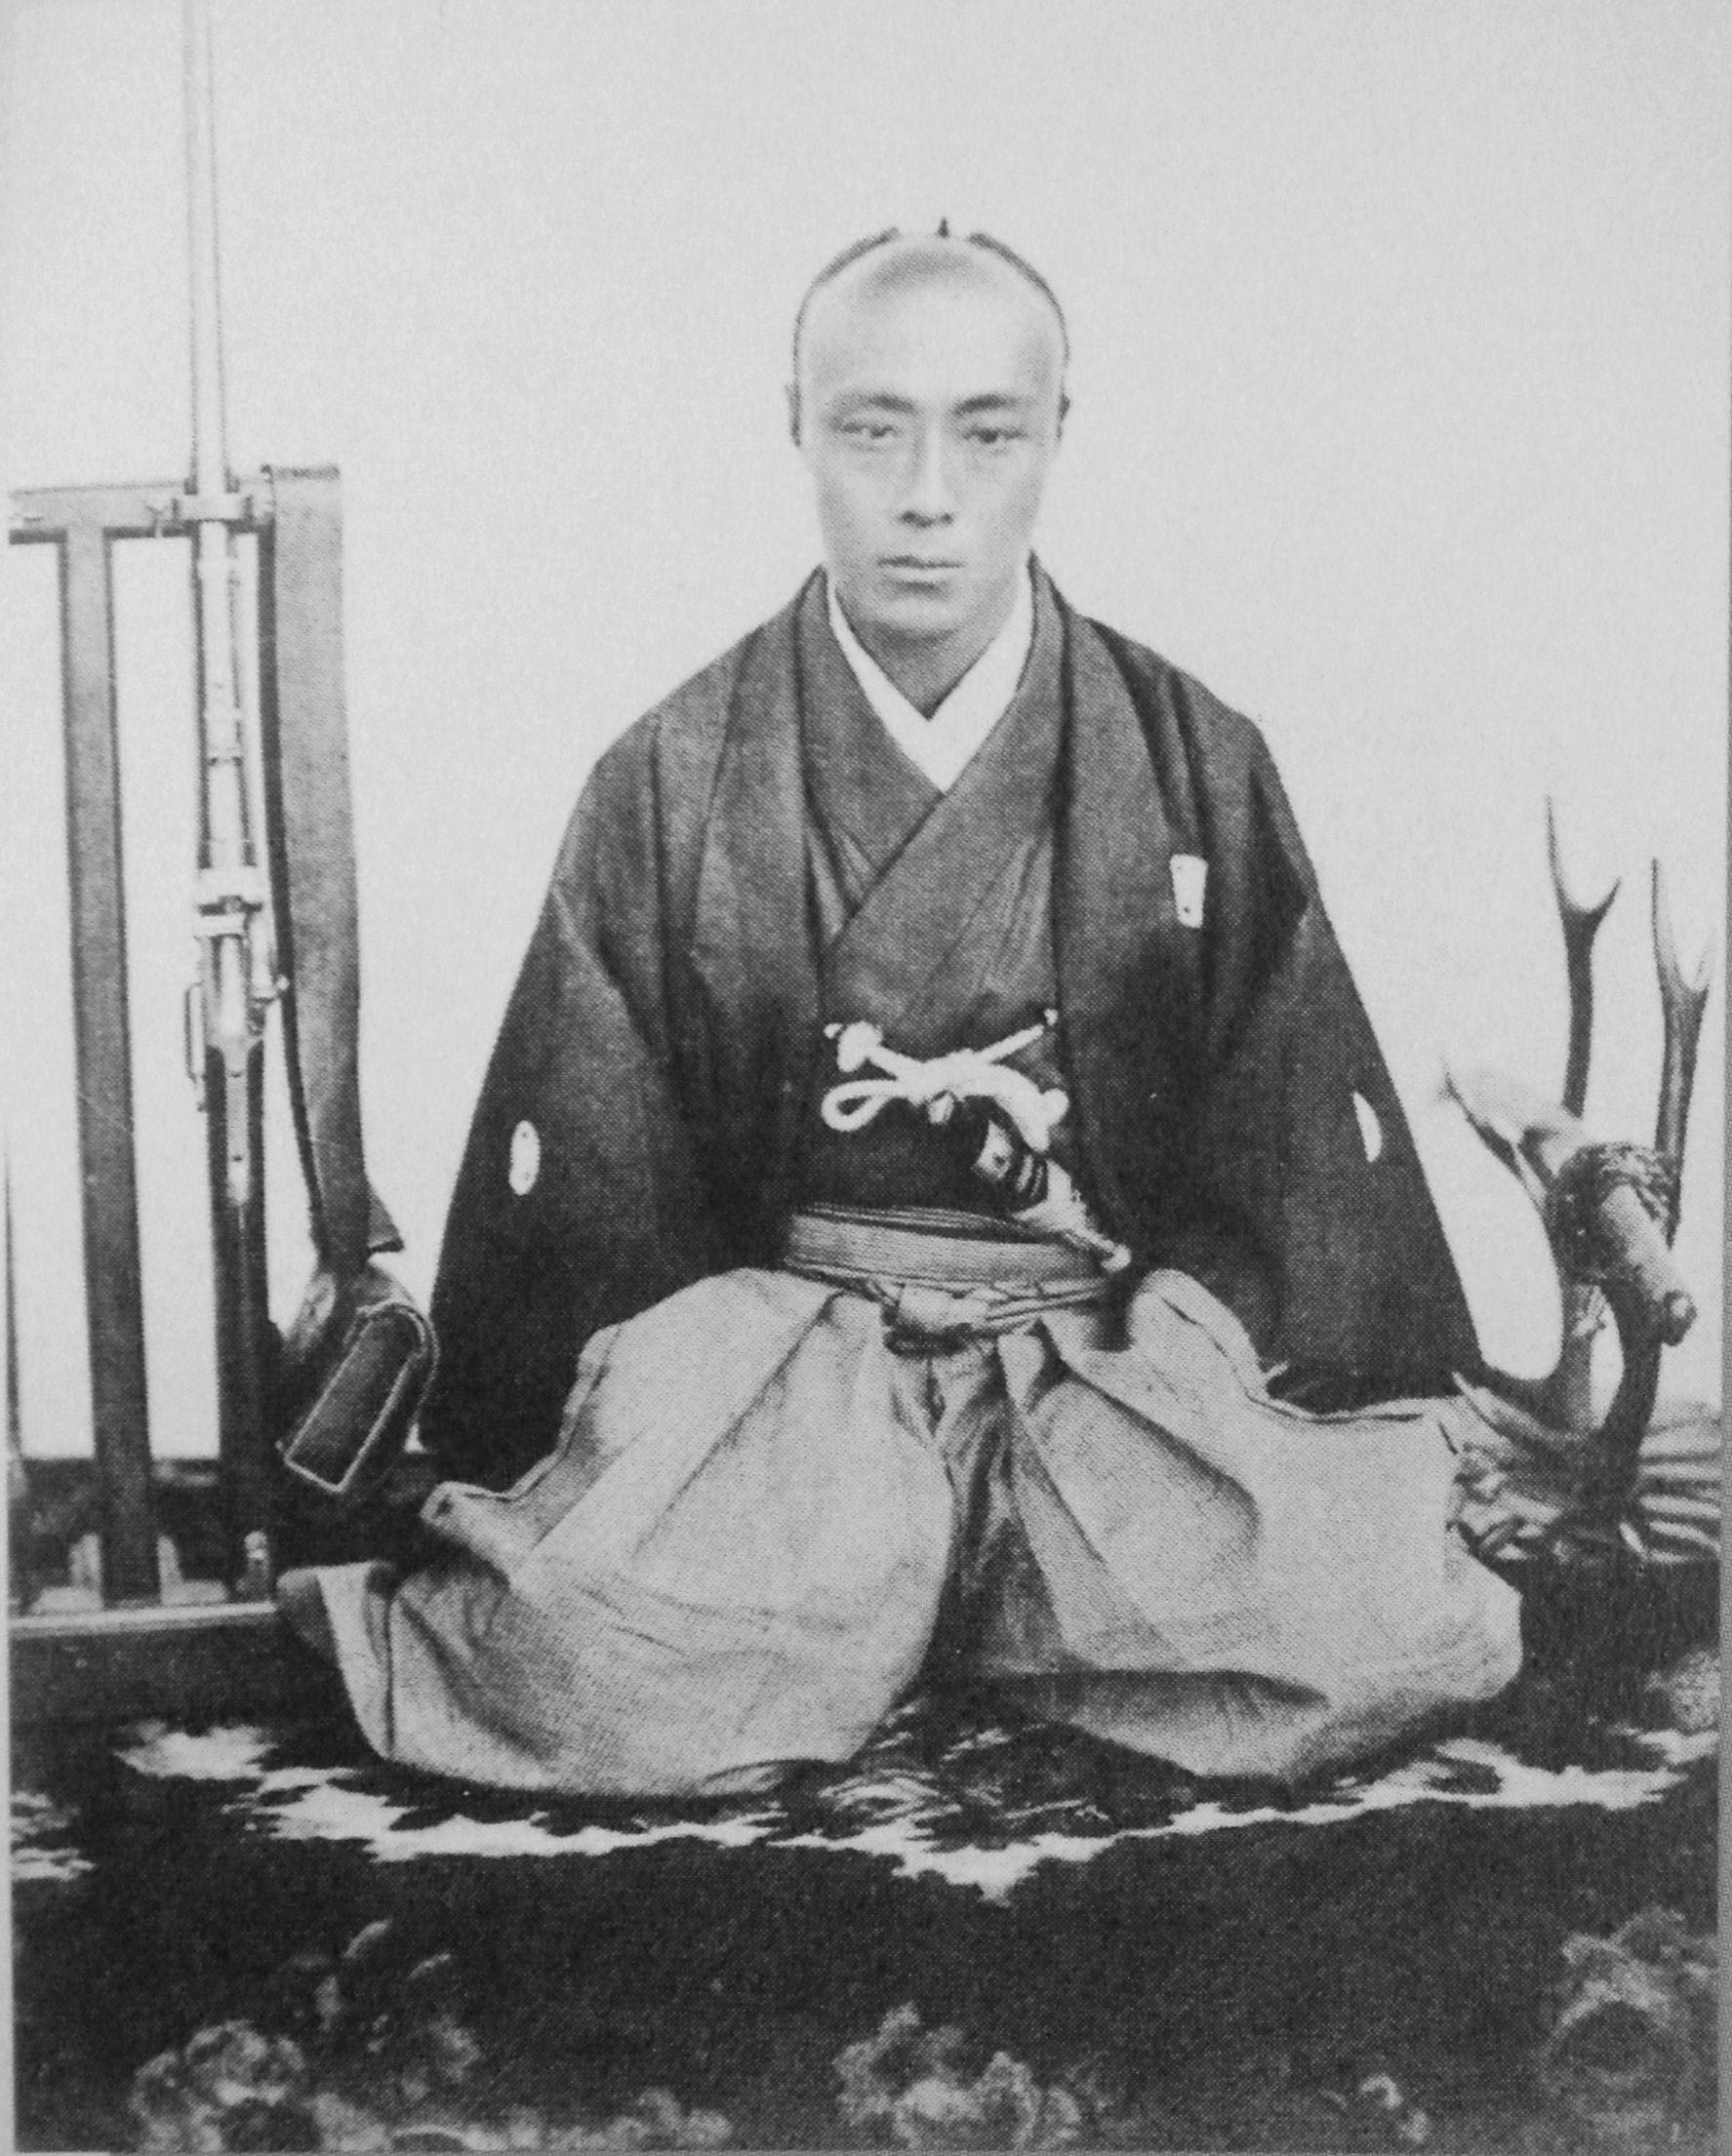 Tokugawa_Yoshinobu_with_rifle